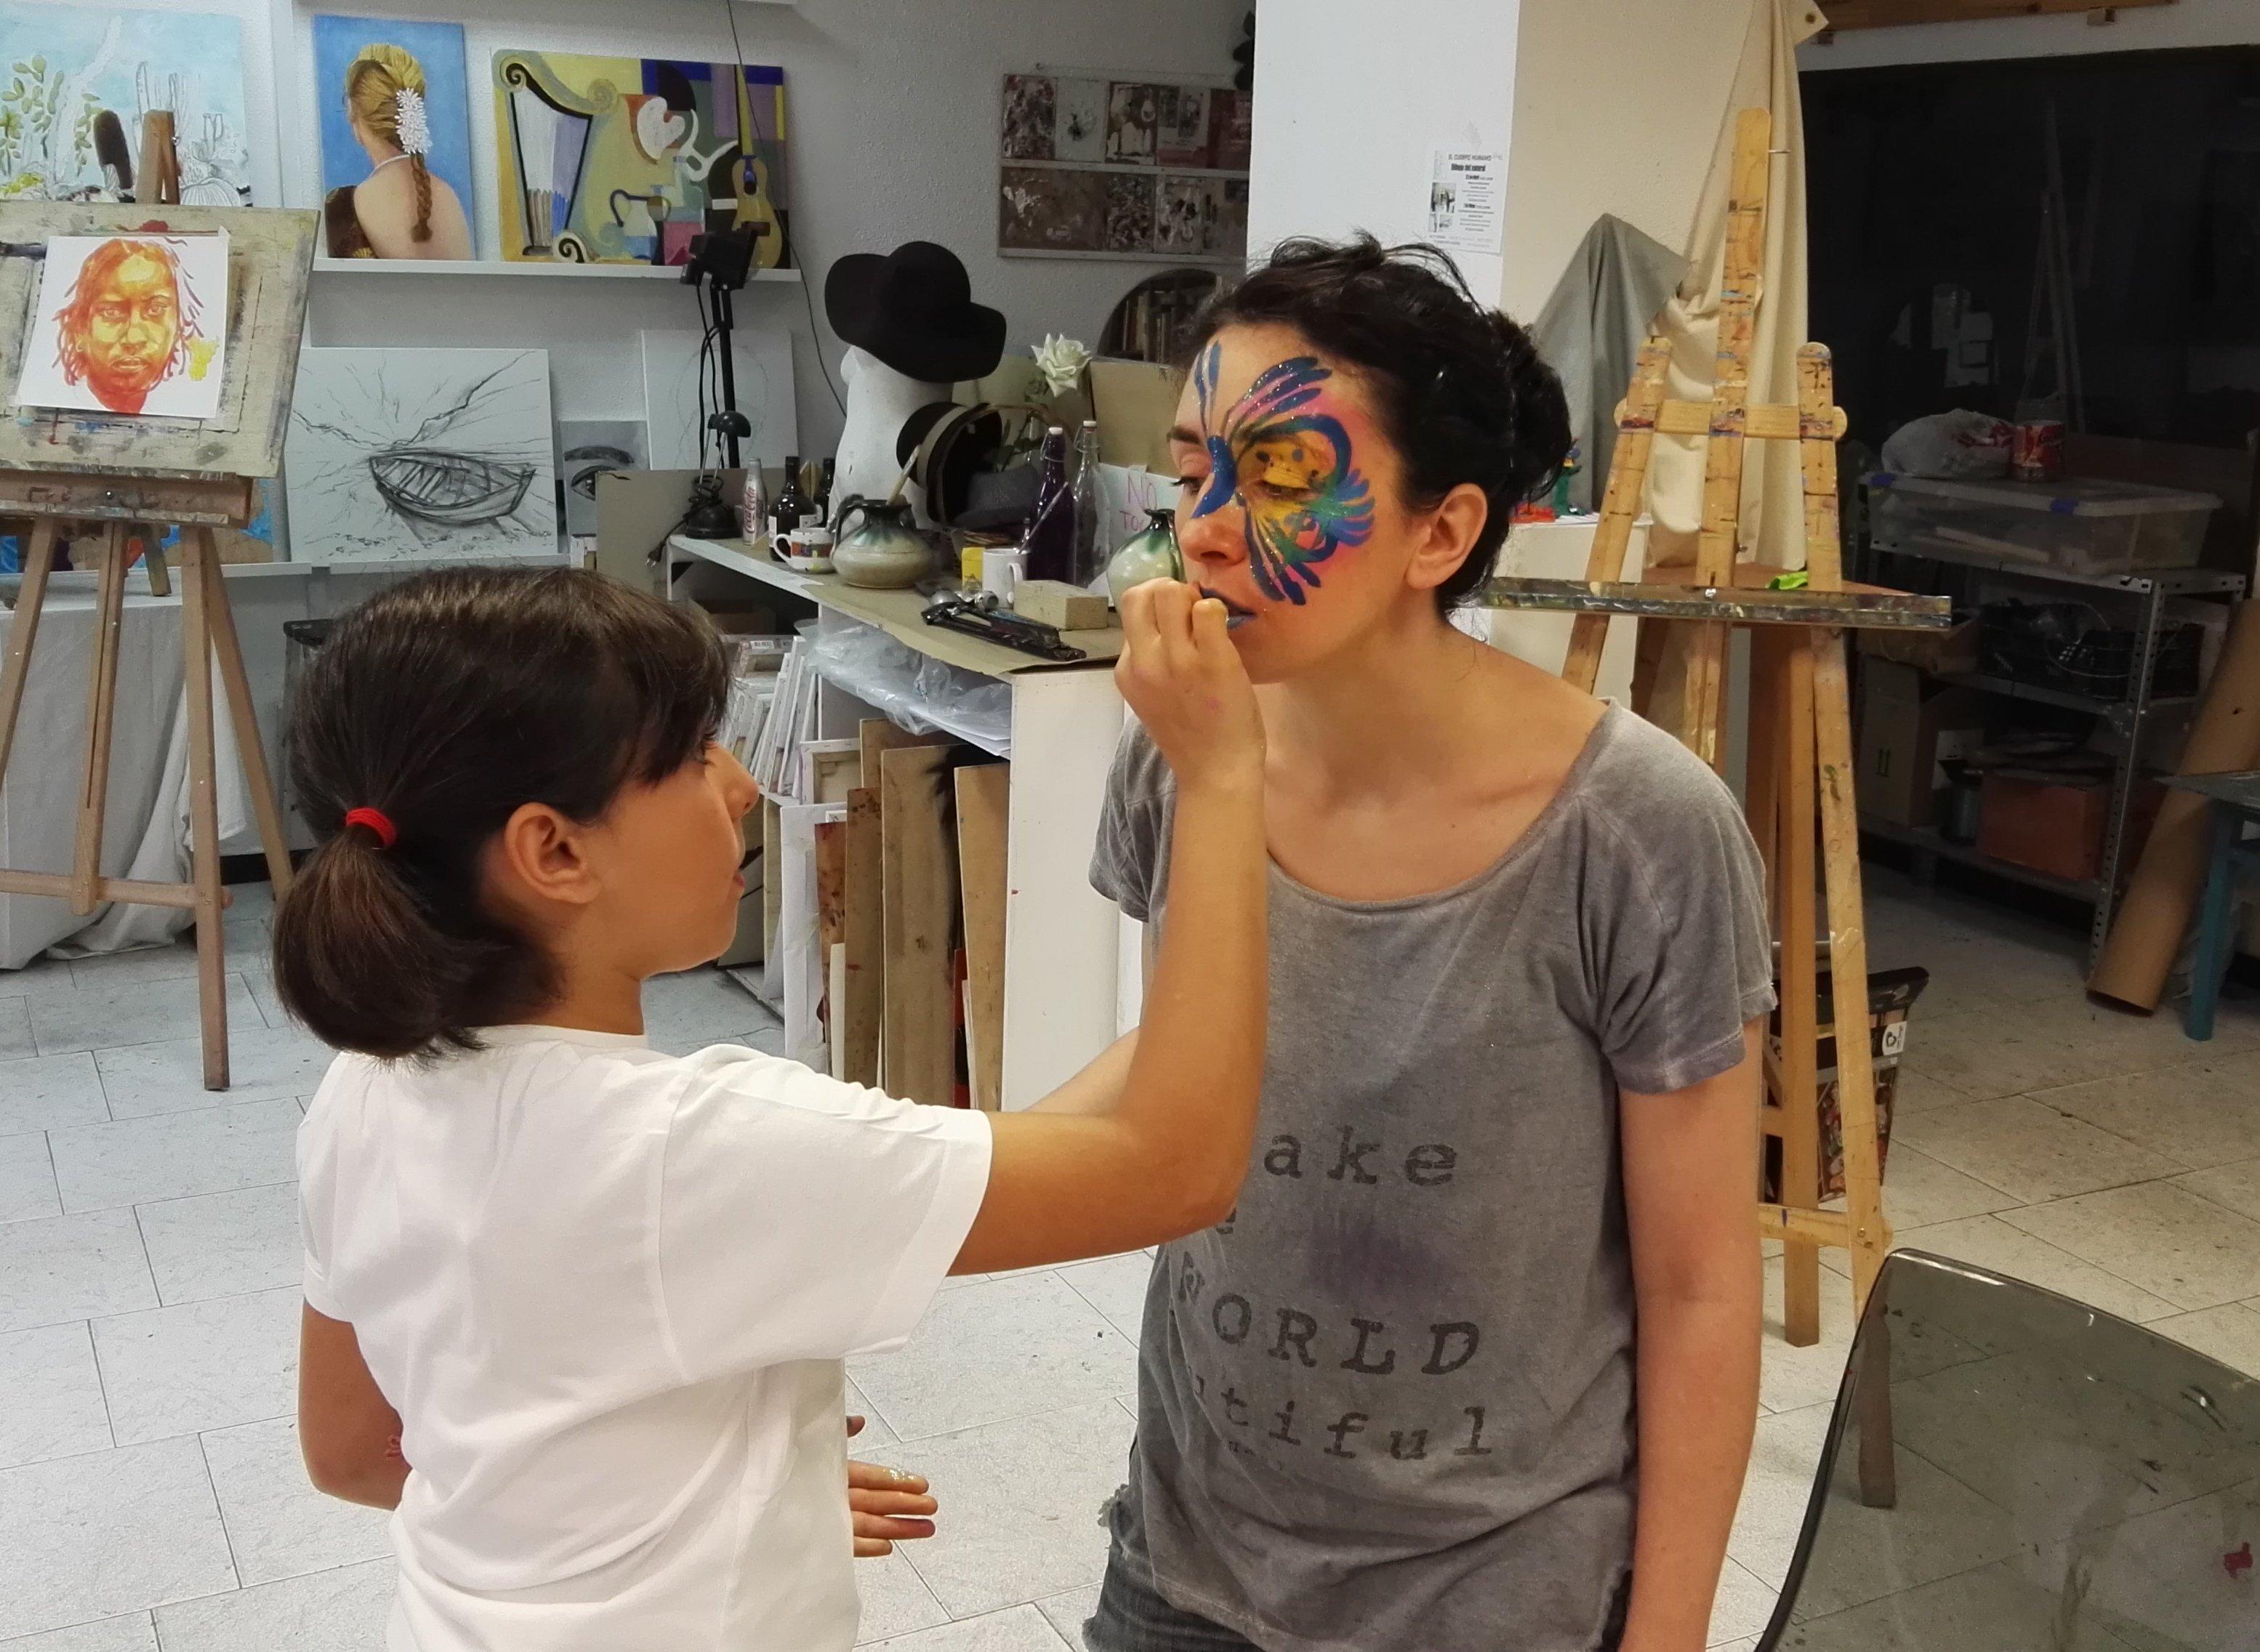 taller de pintacaras, curso de facepaint, curso de pintacaras, aprender maquillaje infantil